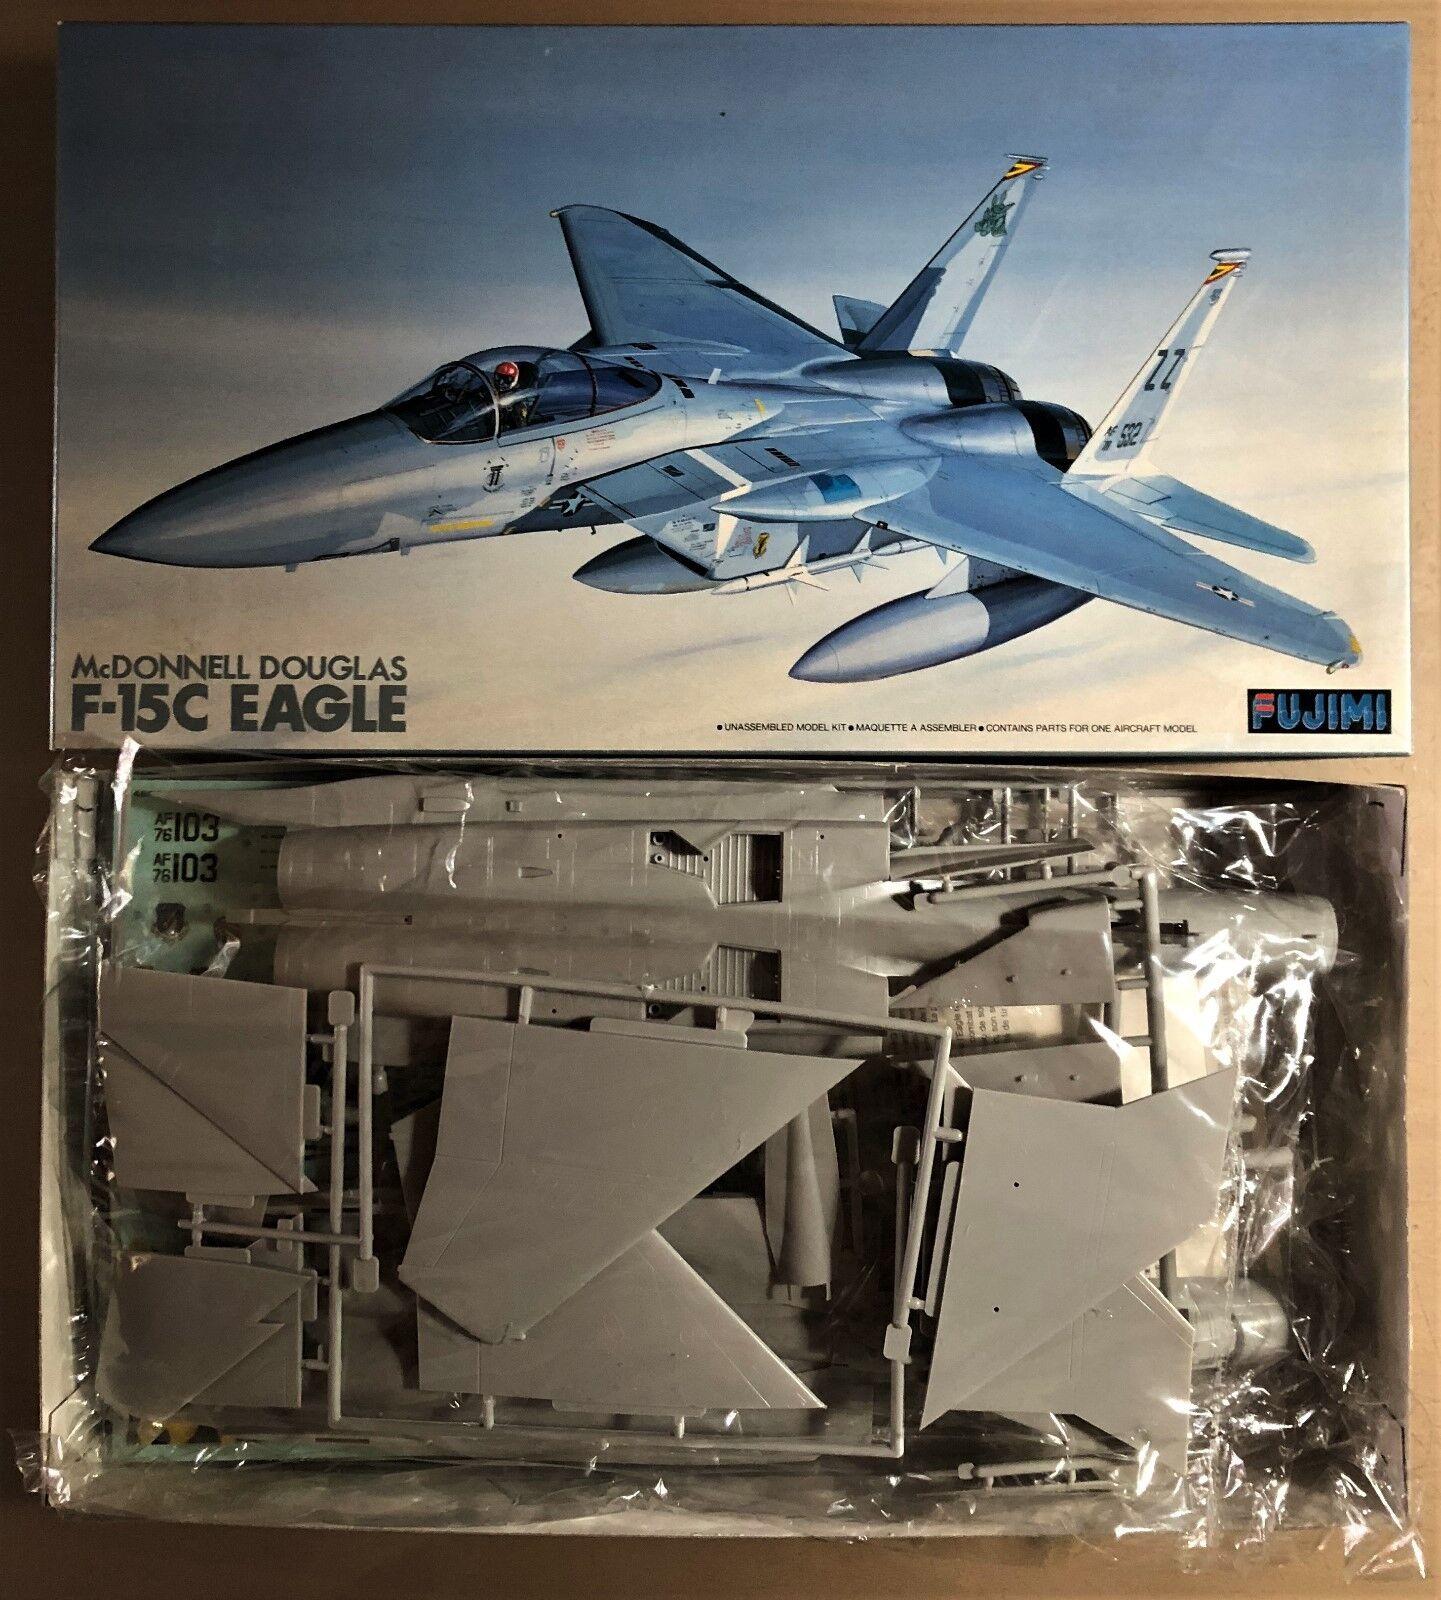 FUJIMI 32004-1500 - McDONNELL DOUGLAS F-15C EAGLE - 1 48 PLASTIC KIT